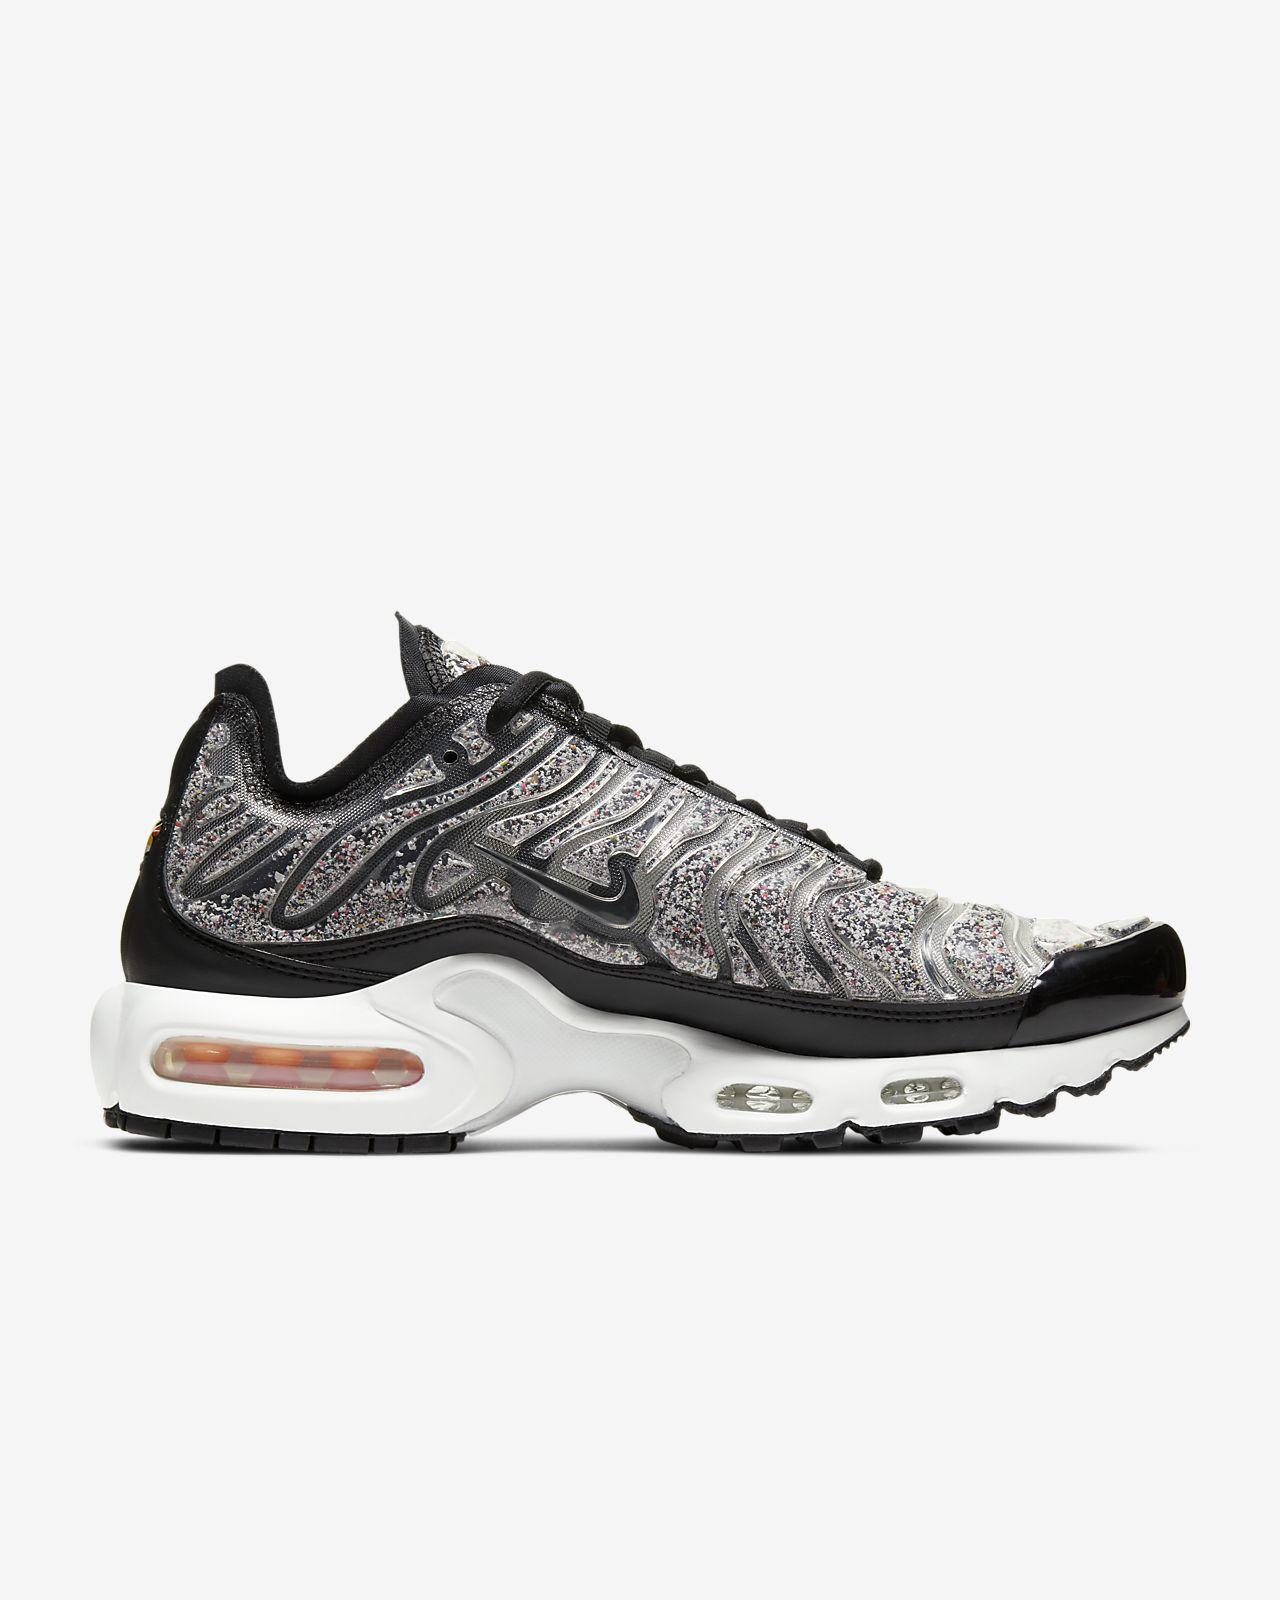 Shoes Nike WMNS AIR MAX PLUS LX